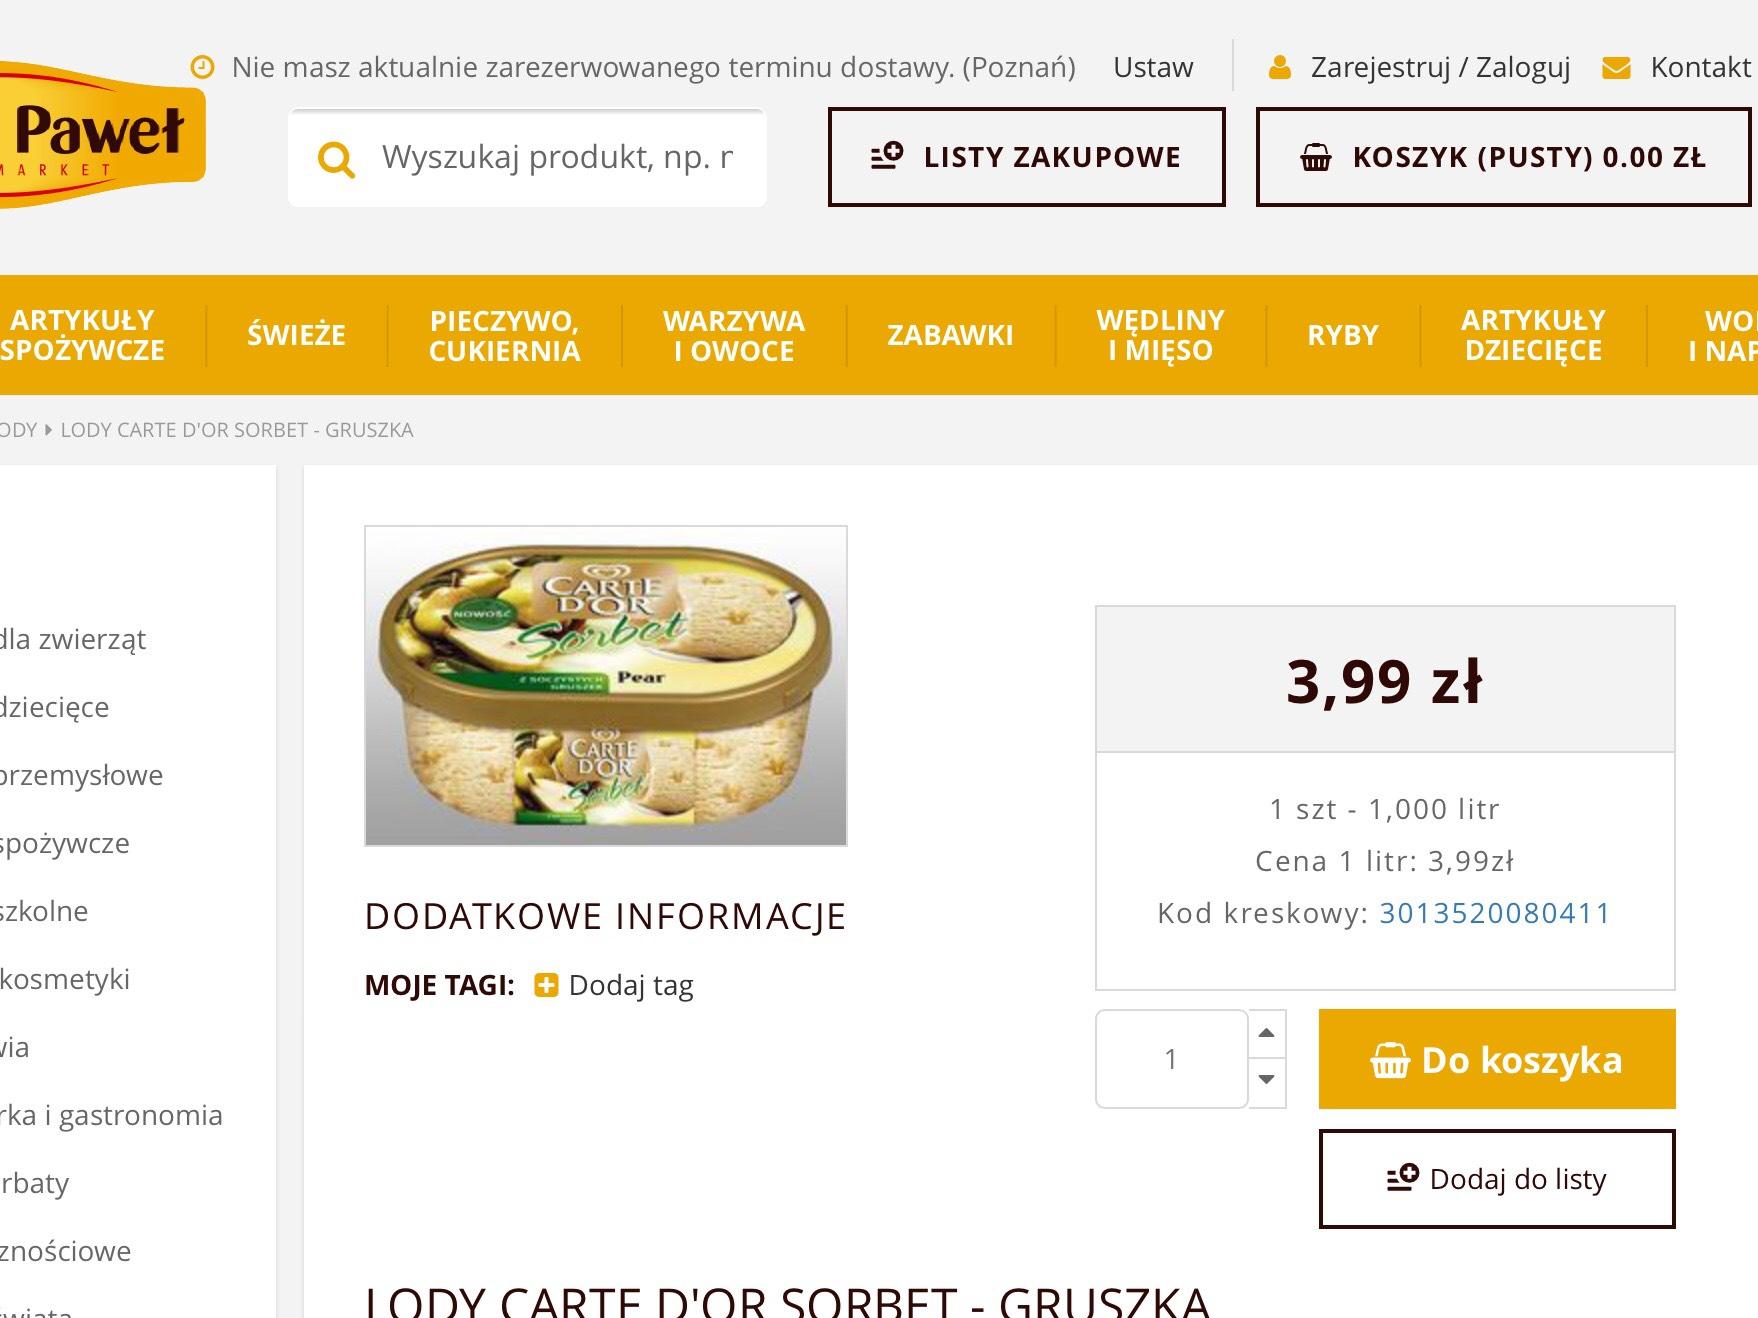 Lody Carte d'or Sorbet gruszka 1000ml  /ePiotriPaweł